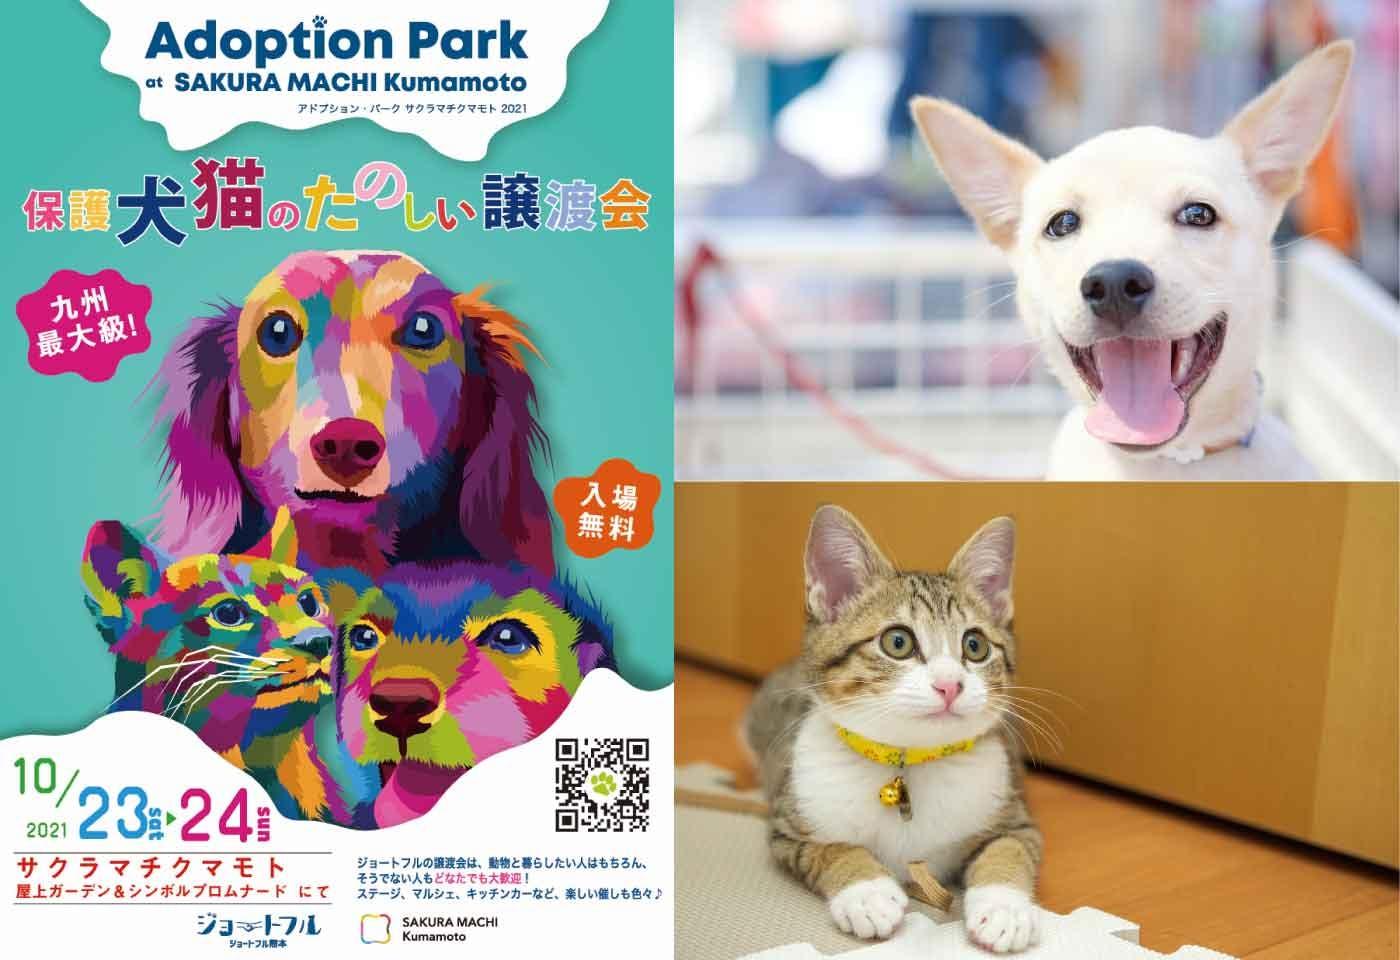 ADOPTION PARKって何?九州最大級の楽しい保護犬猫の譲渡会が「サクラマチクマモト」で開催!